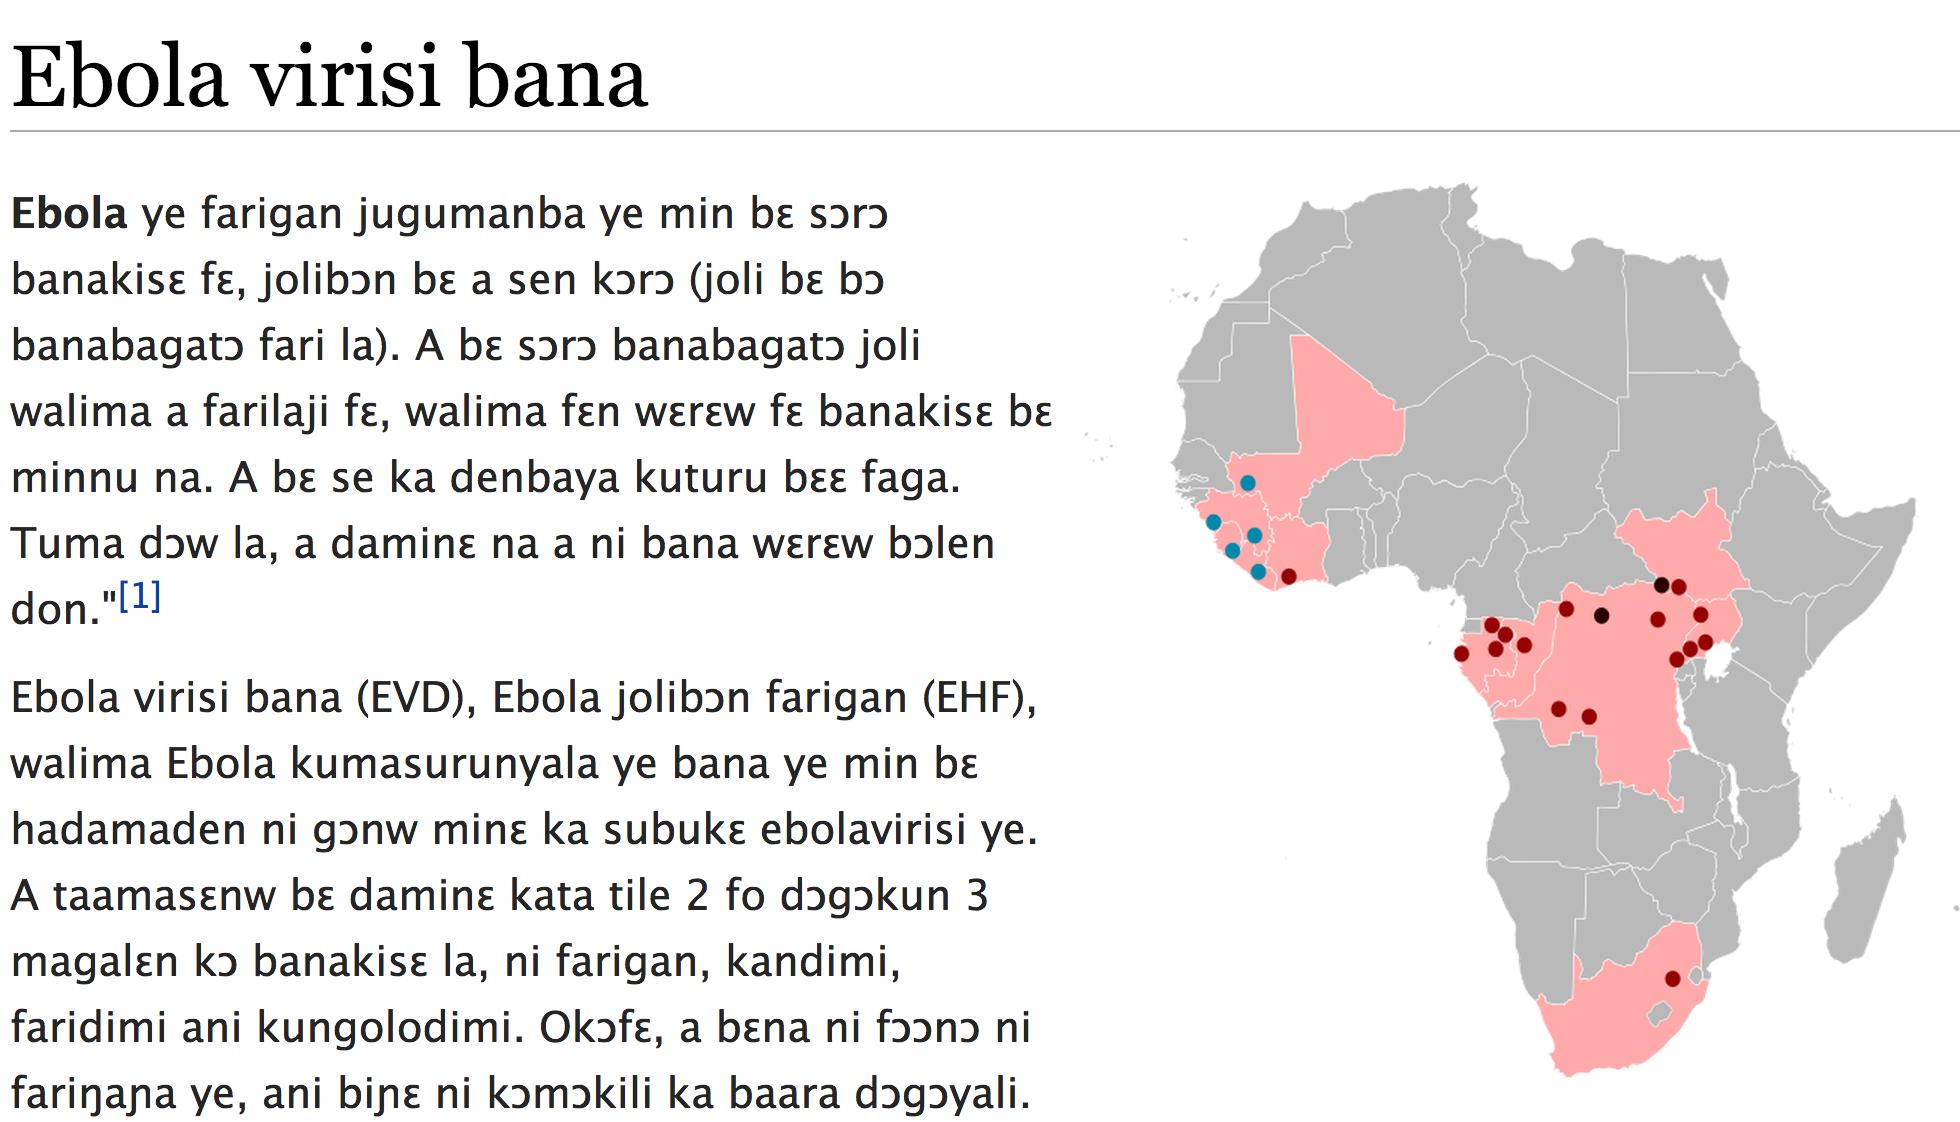 Ebola Wikipedia